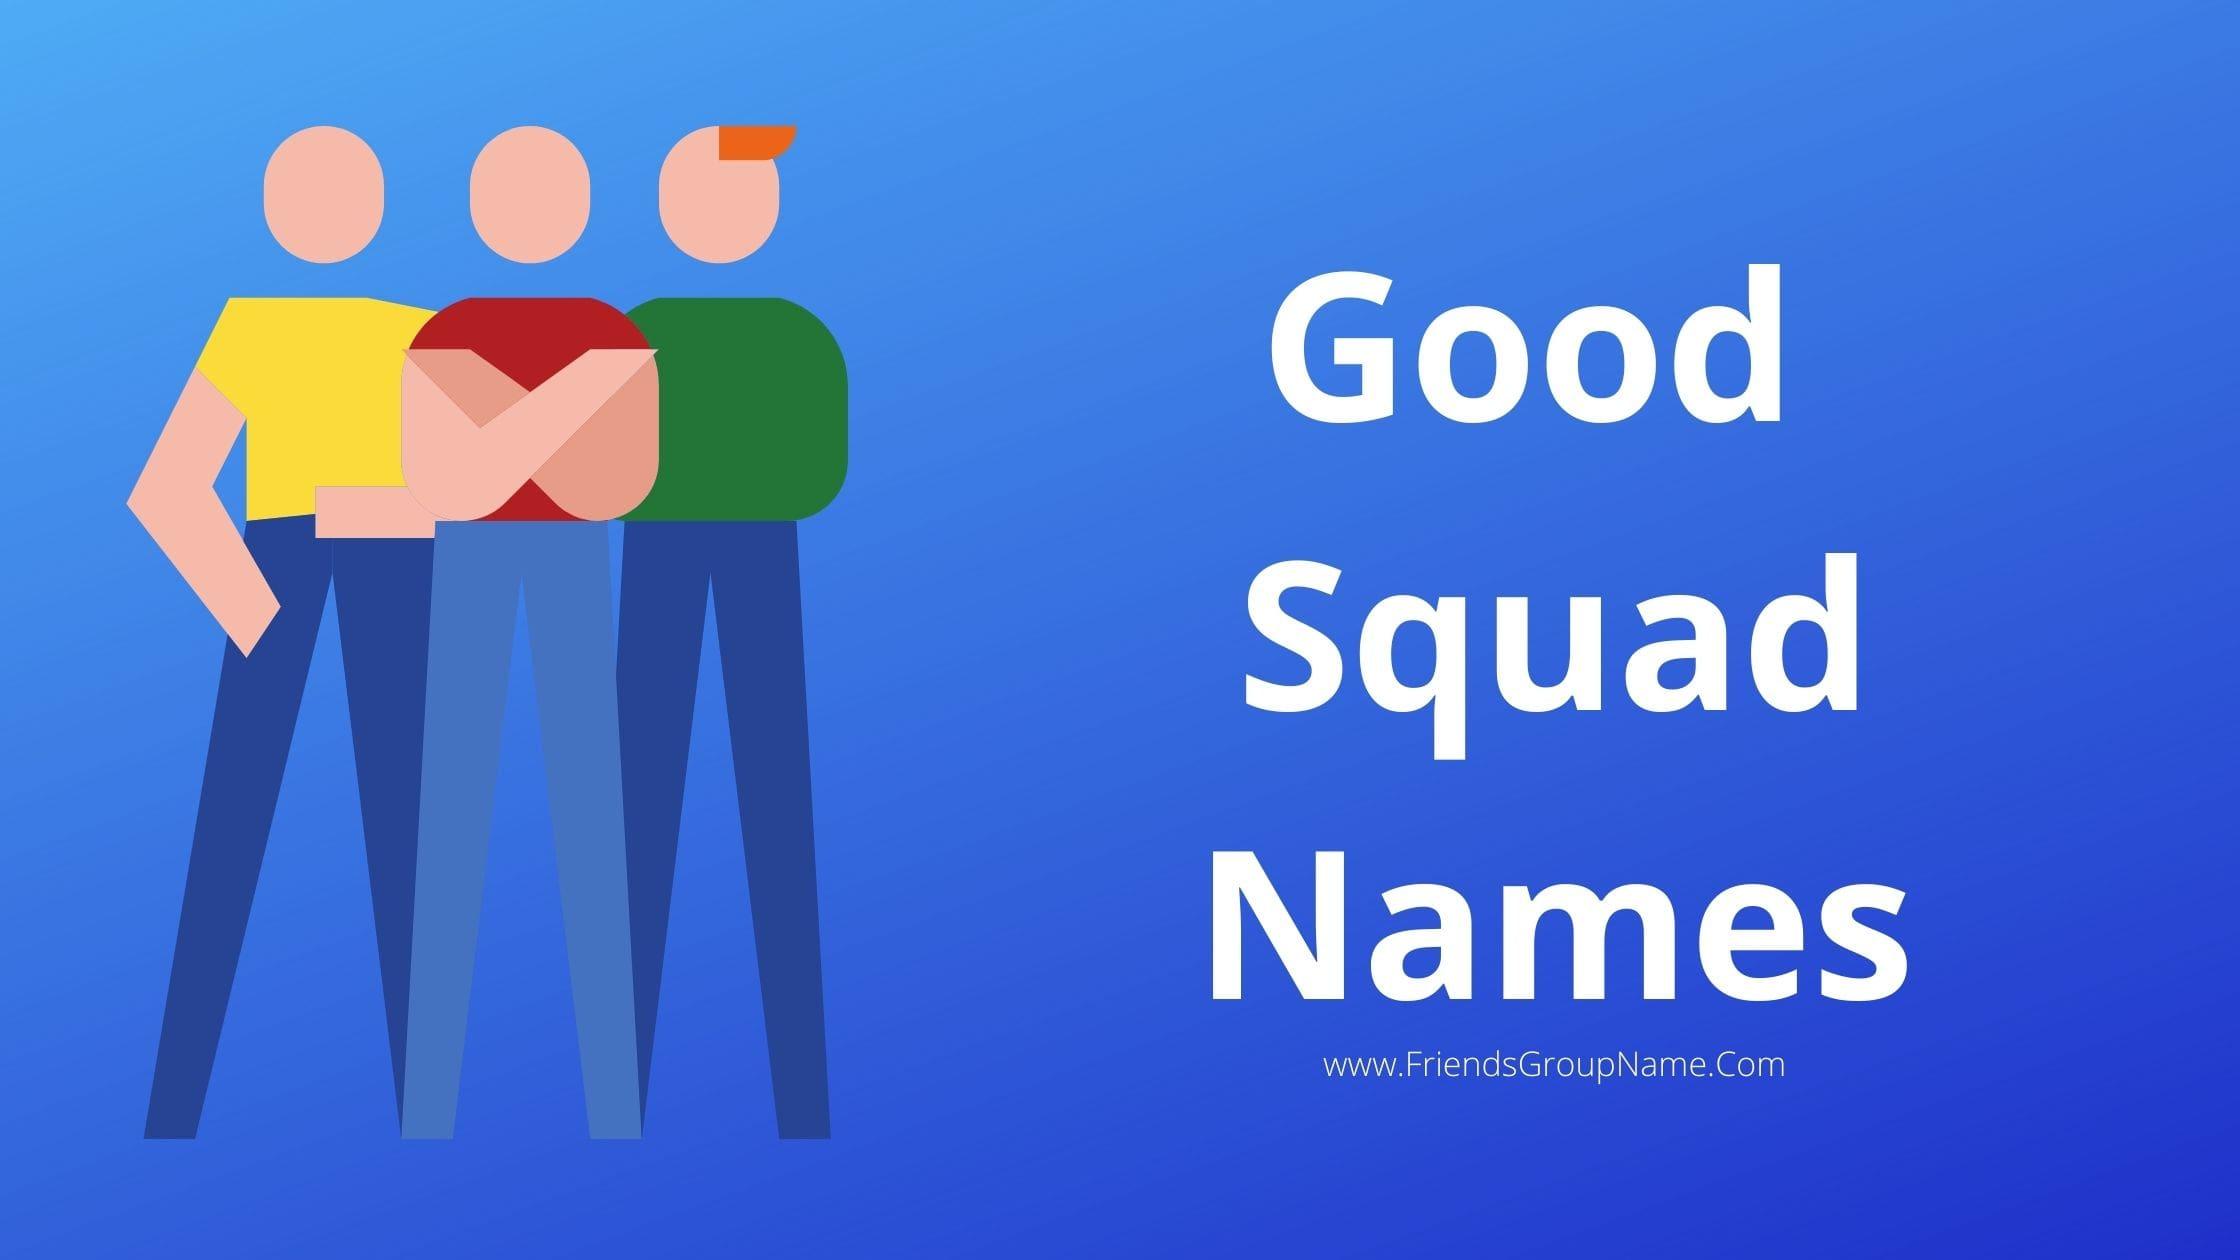 Good Squad Names